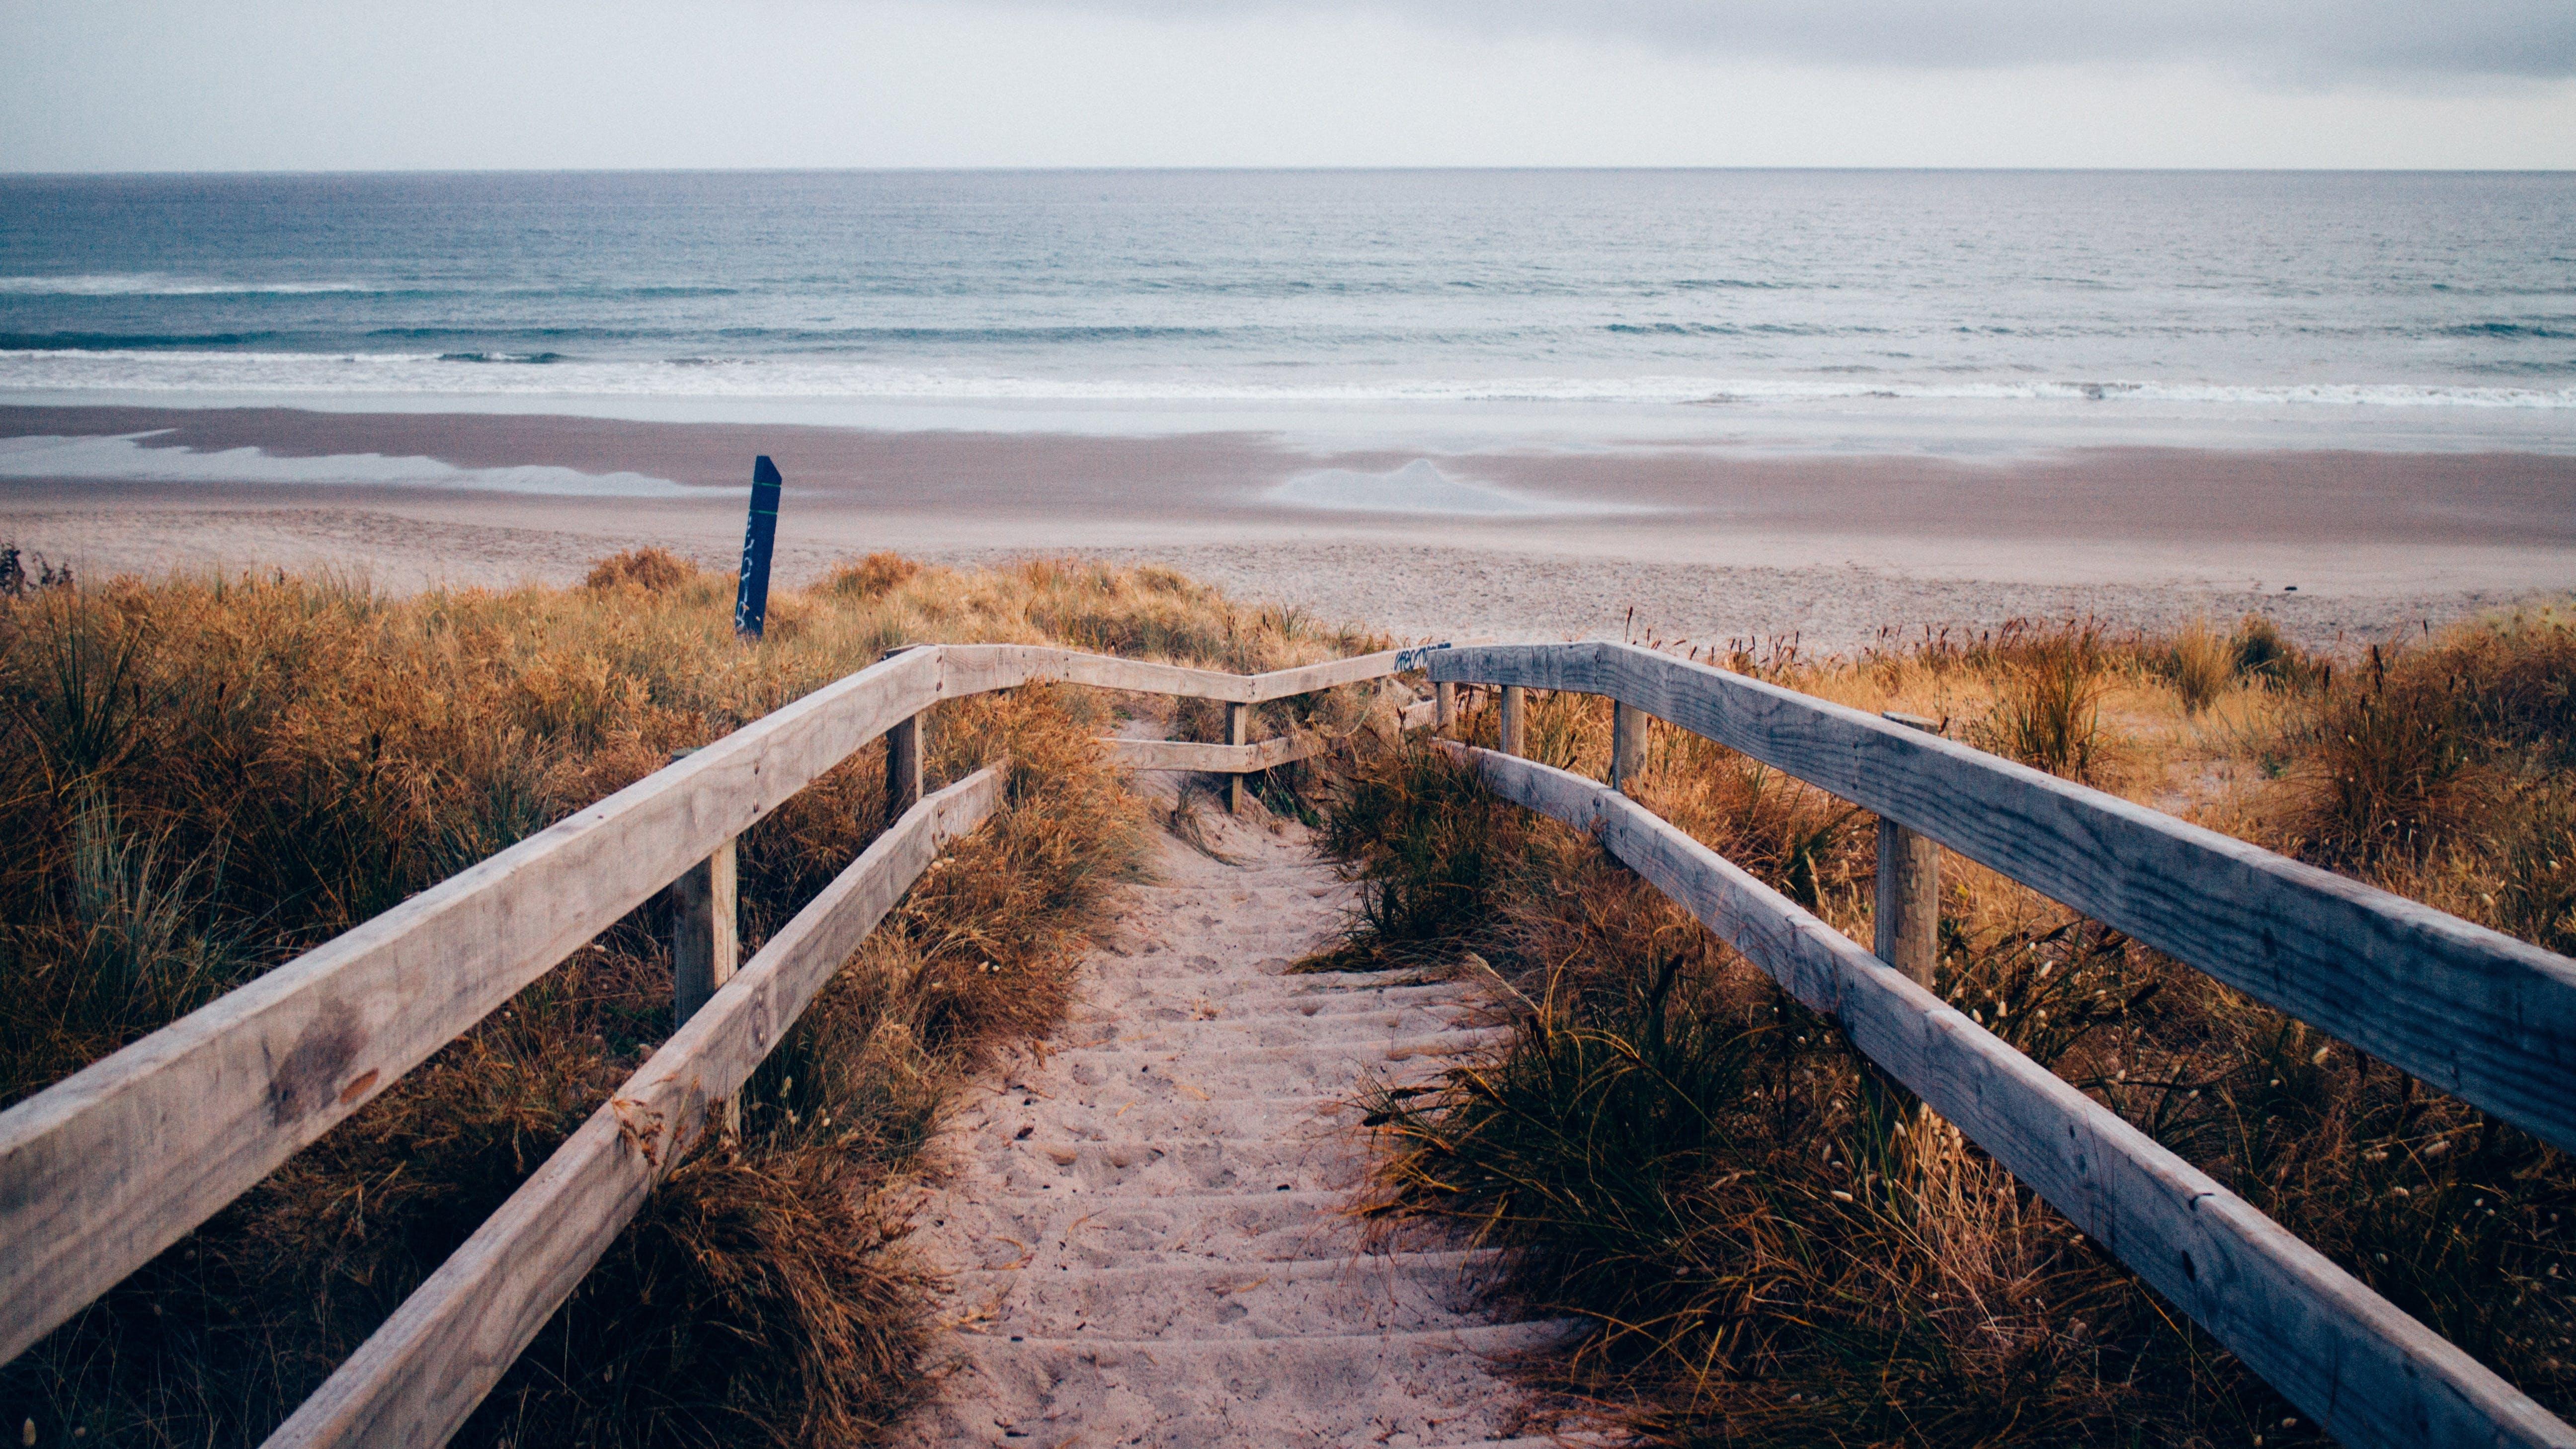 Free stock photo of landscape, beach, sand, ocean